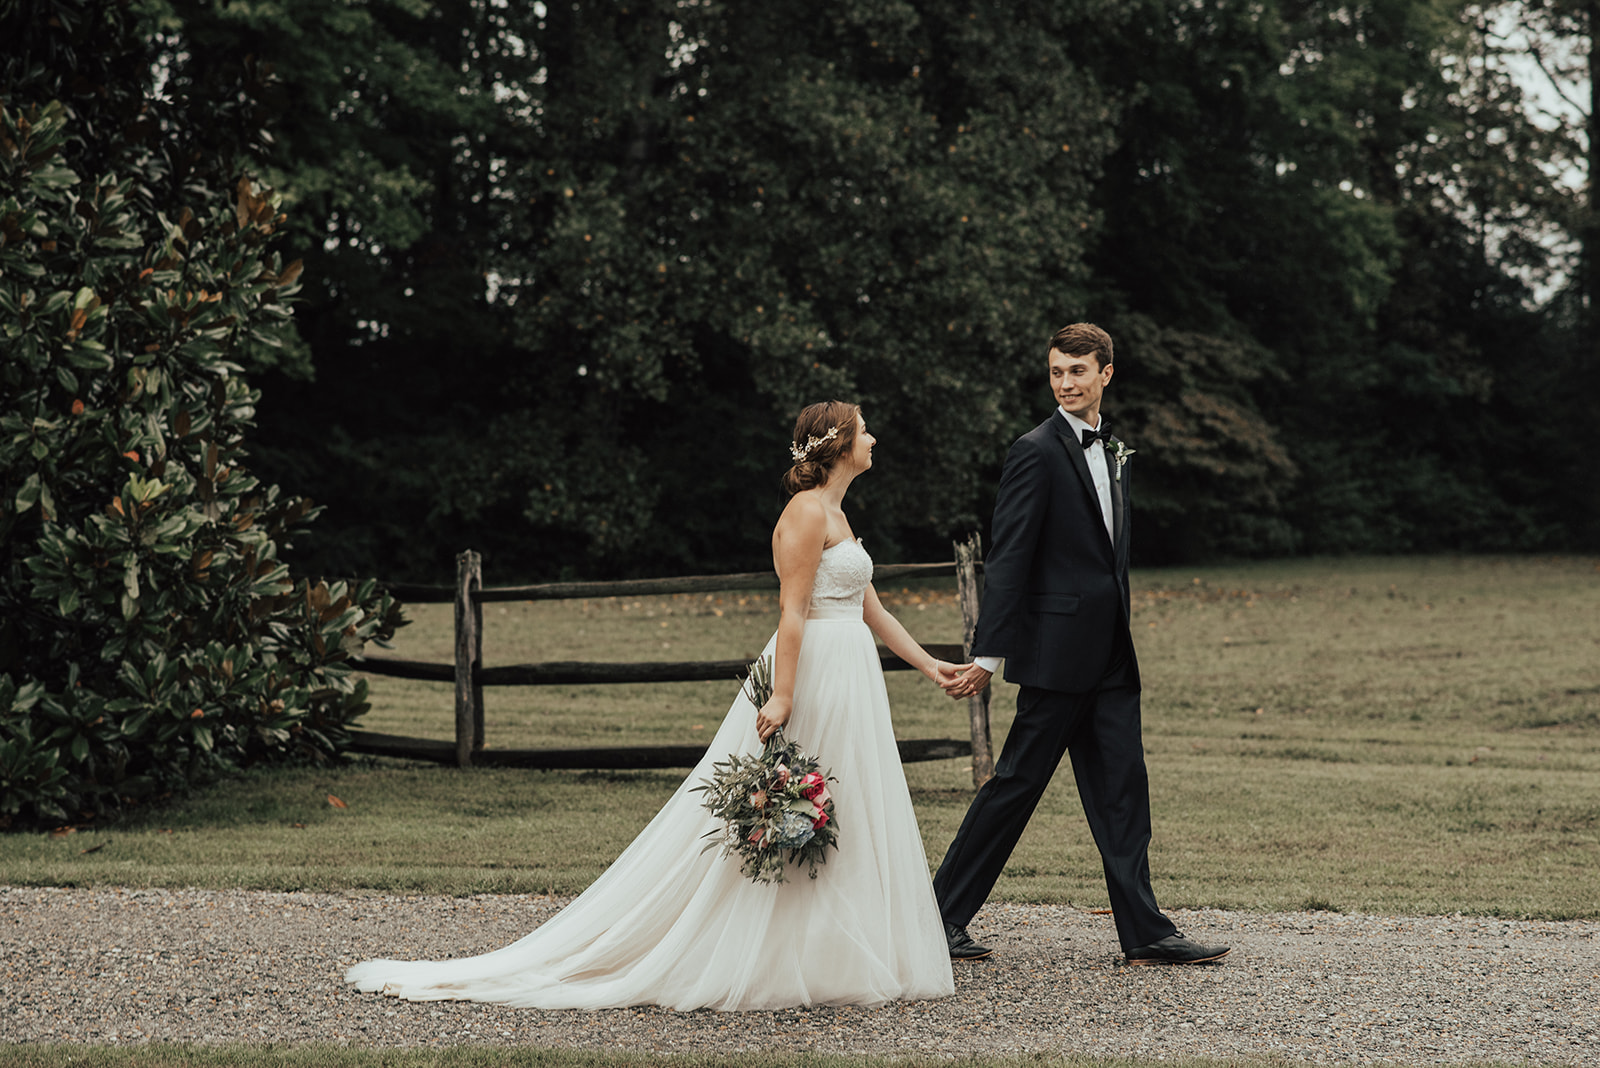 Richmond VA Wedding By SB Photographs224224.jpg